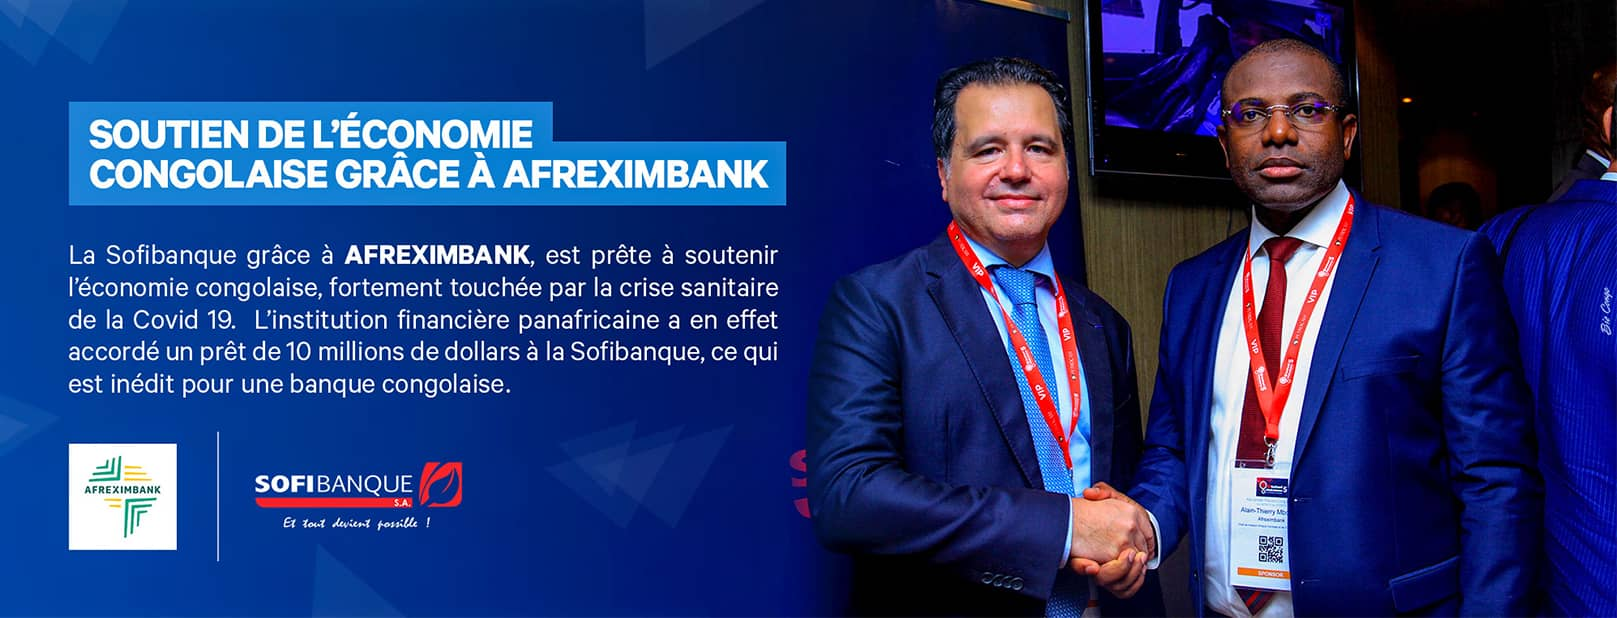 sofibanque-banner-24072020